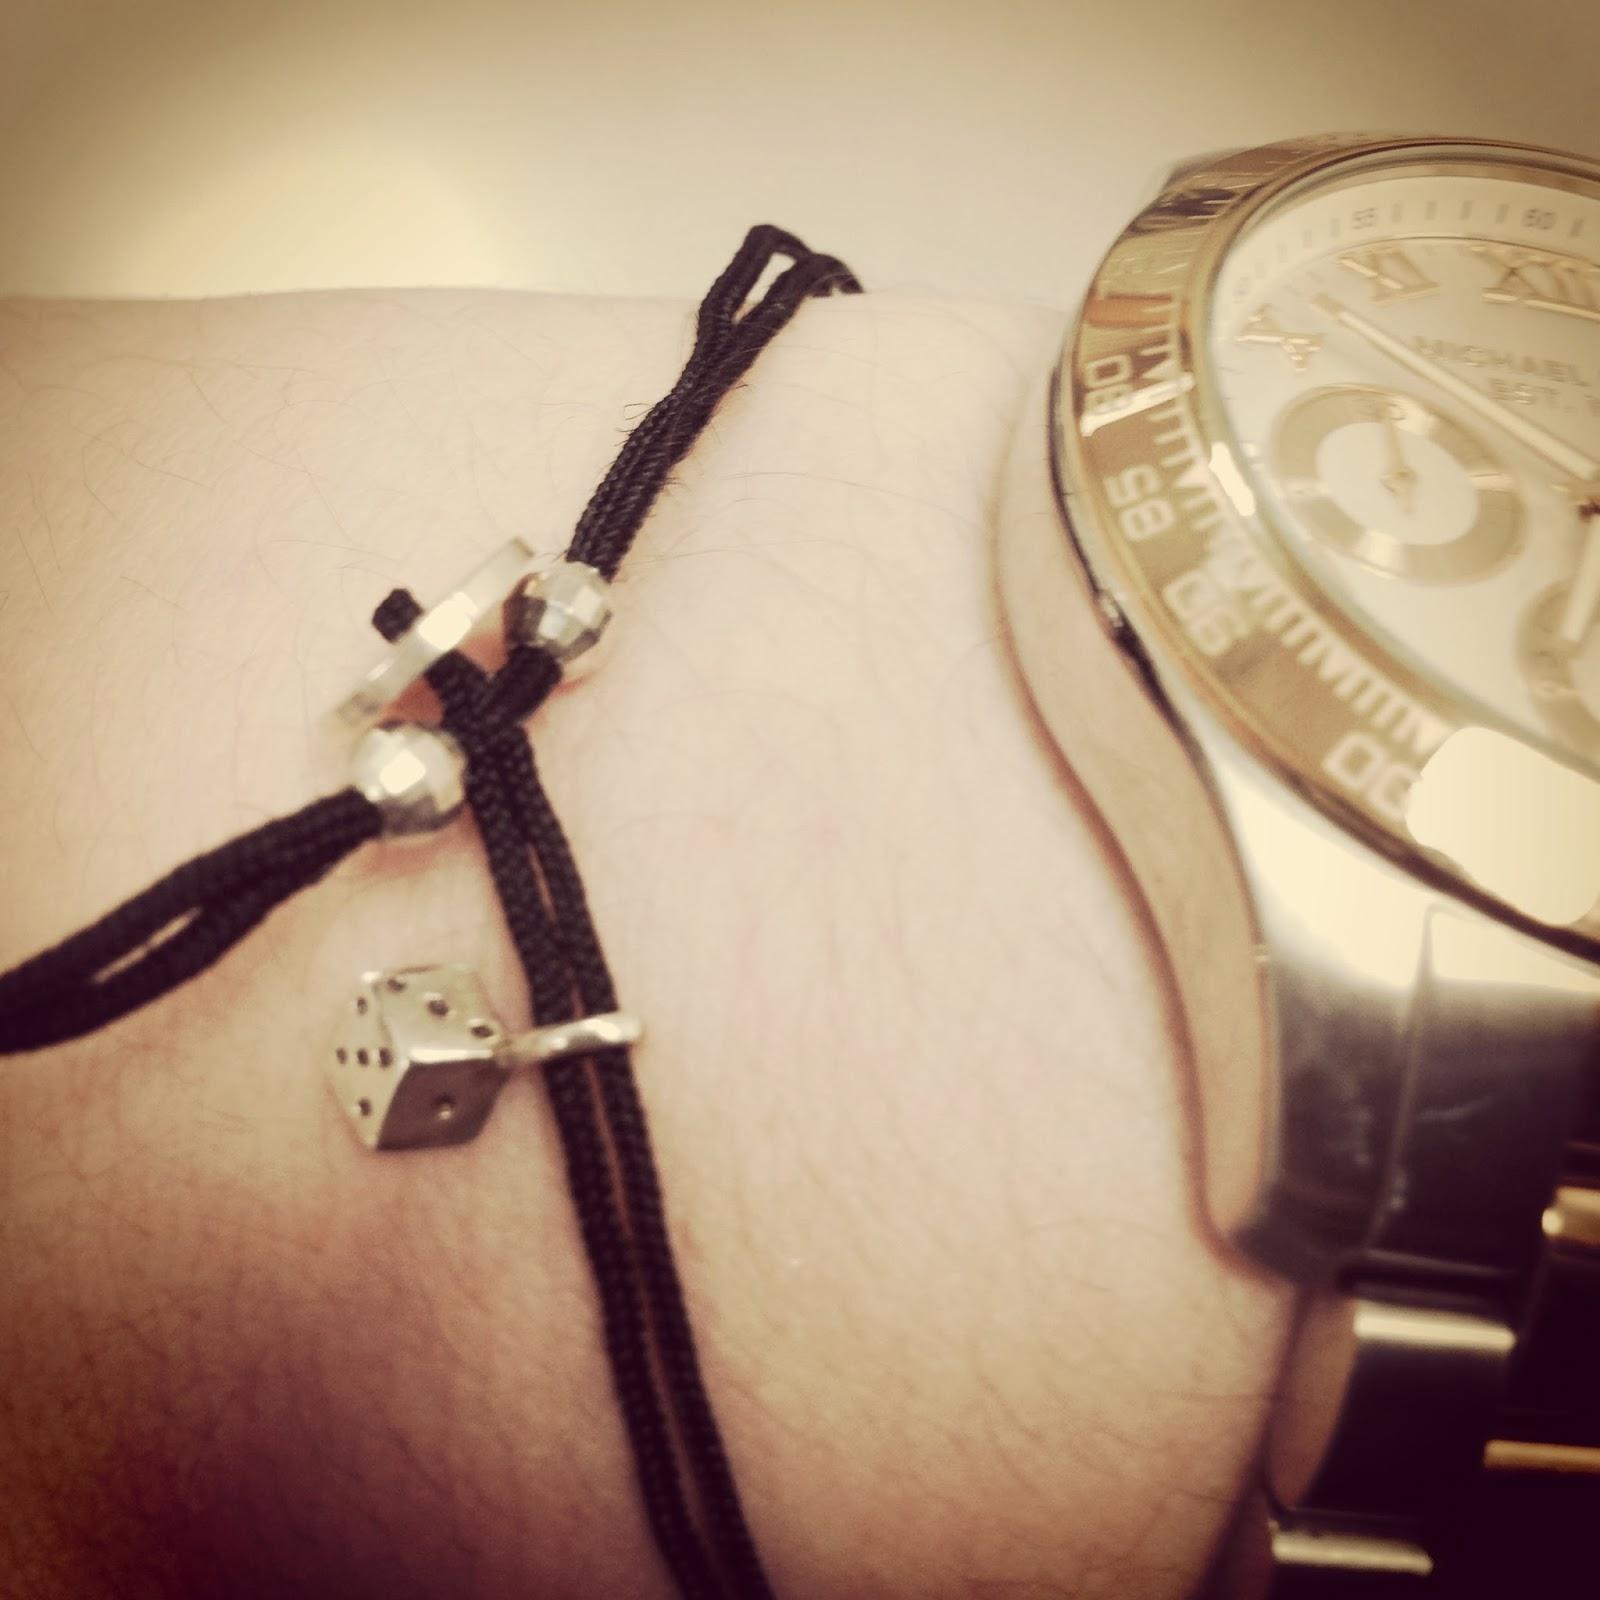 michael kors layton, alex woo dice cord bracelet